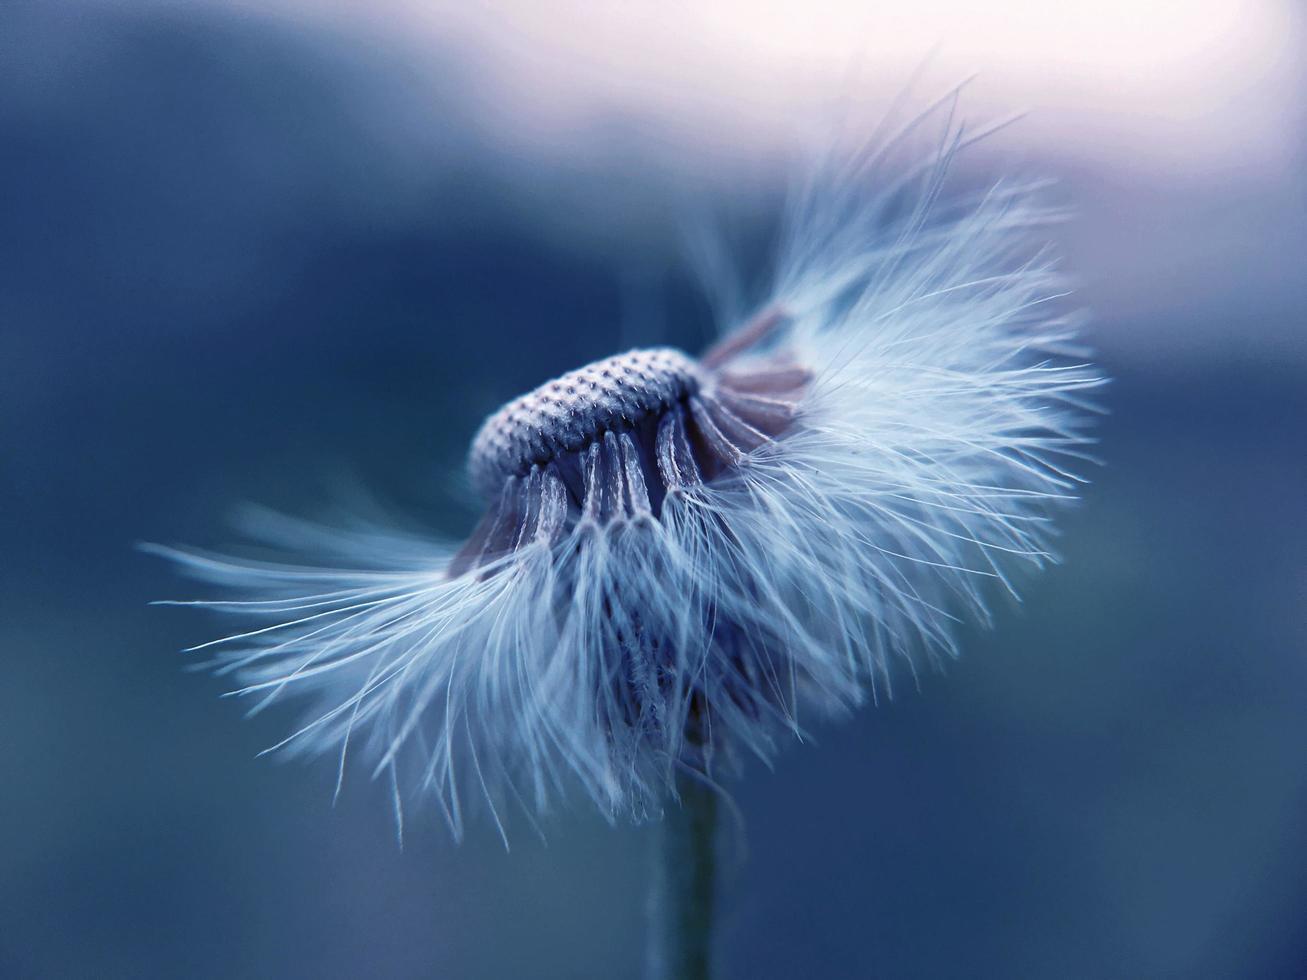 fiore di tarassaco petalo bianco in blu foto